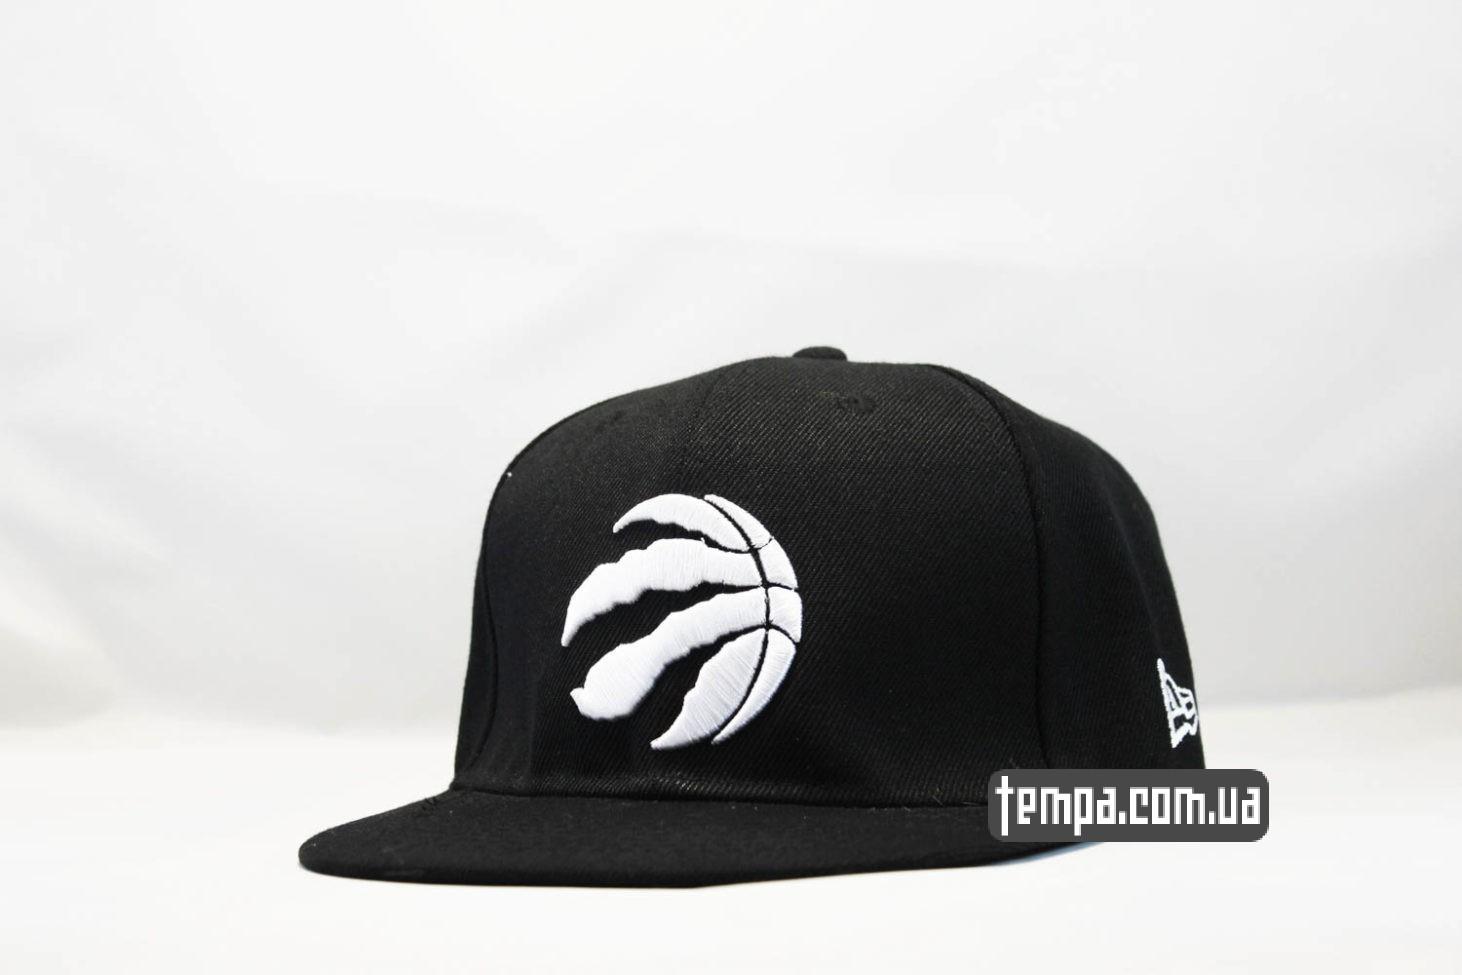 кепка snapback basket ball NBA NEW ERA баскетбольный маяч